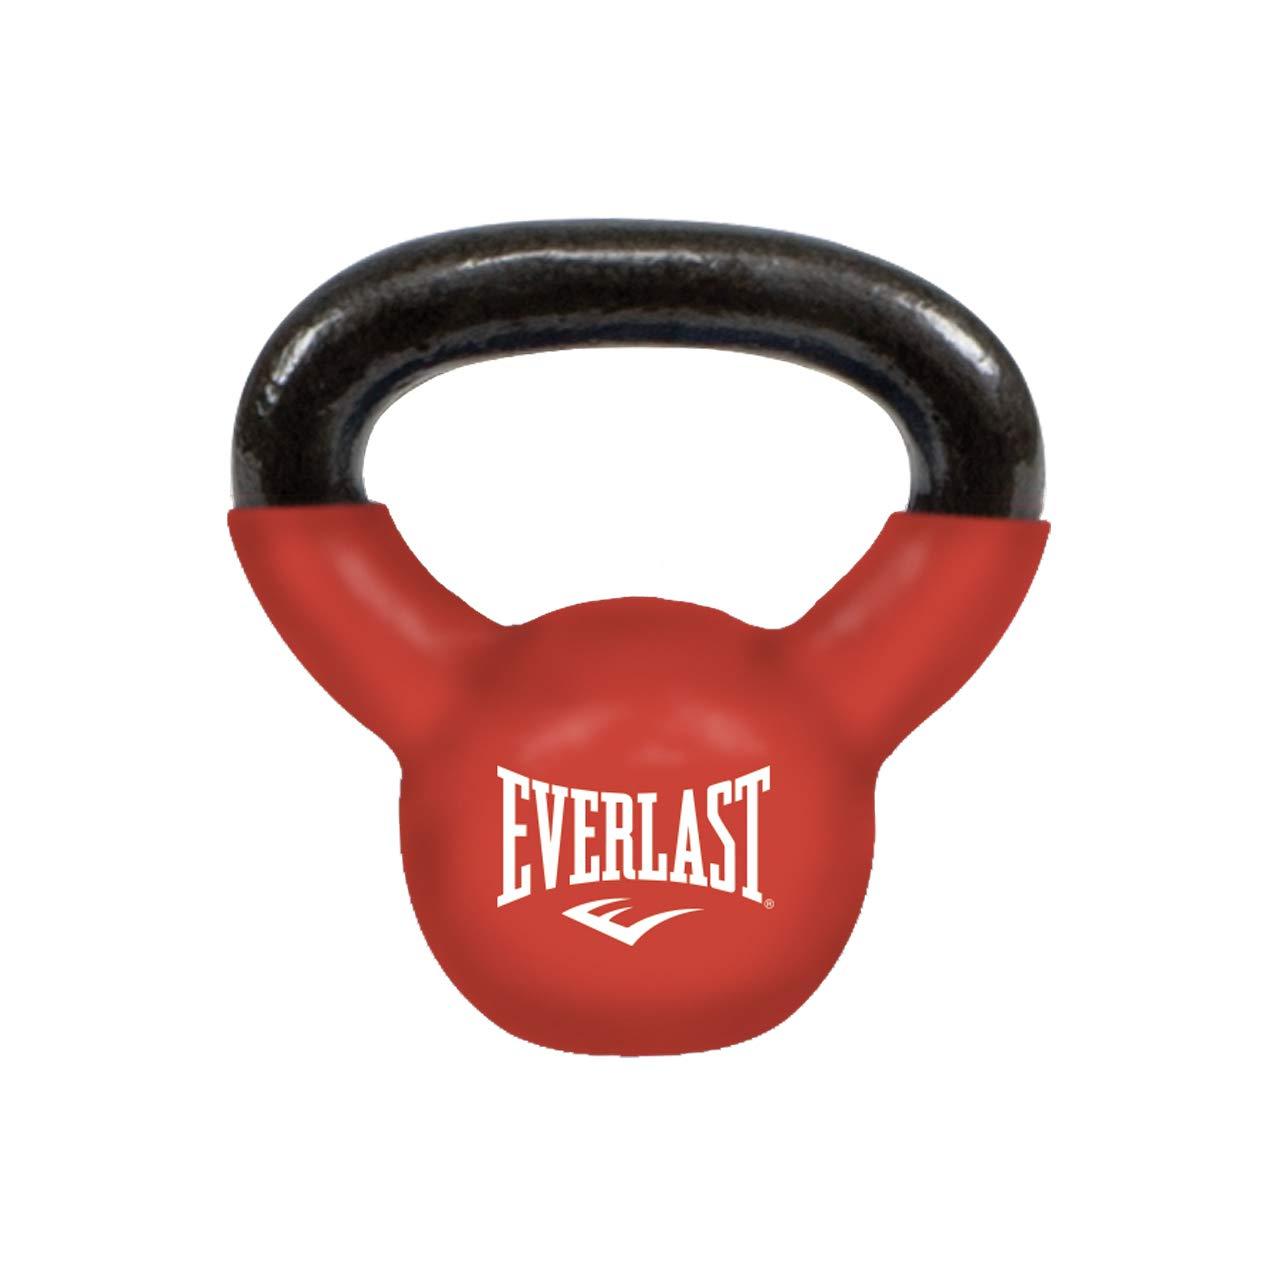 Everlast P00001800 Kugelhantel mit Vinyl-Überzug